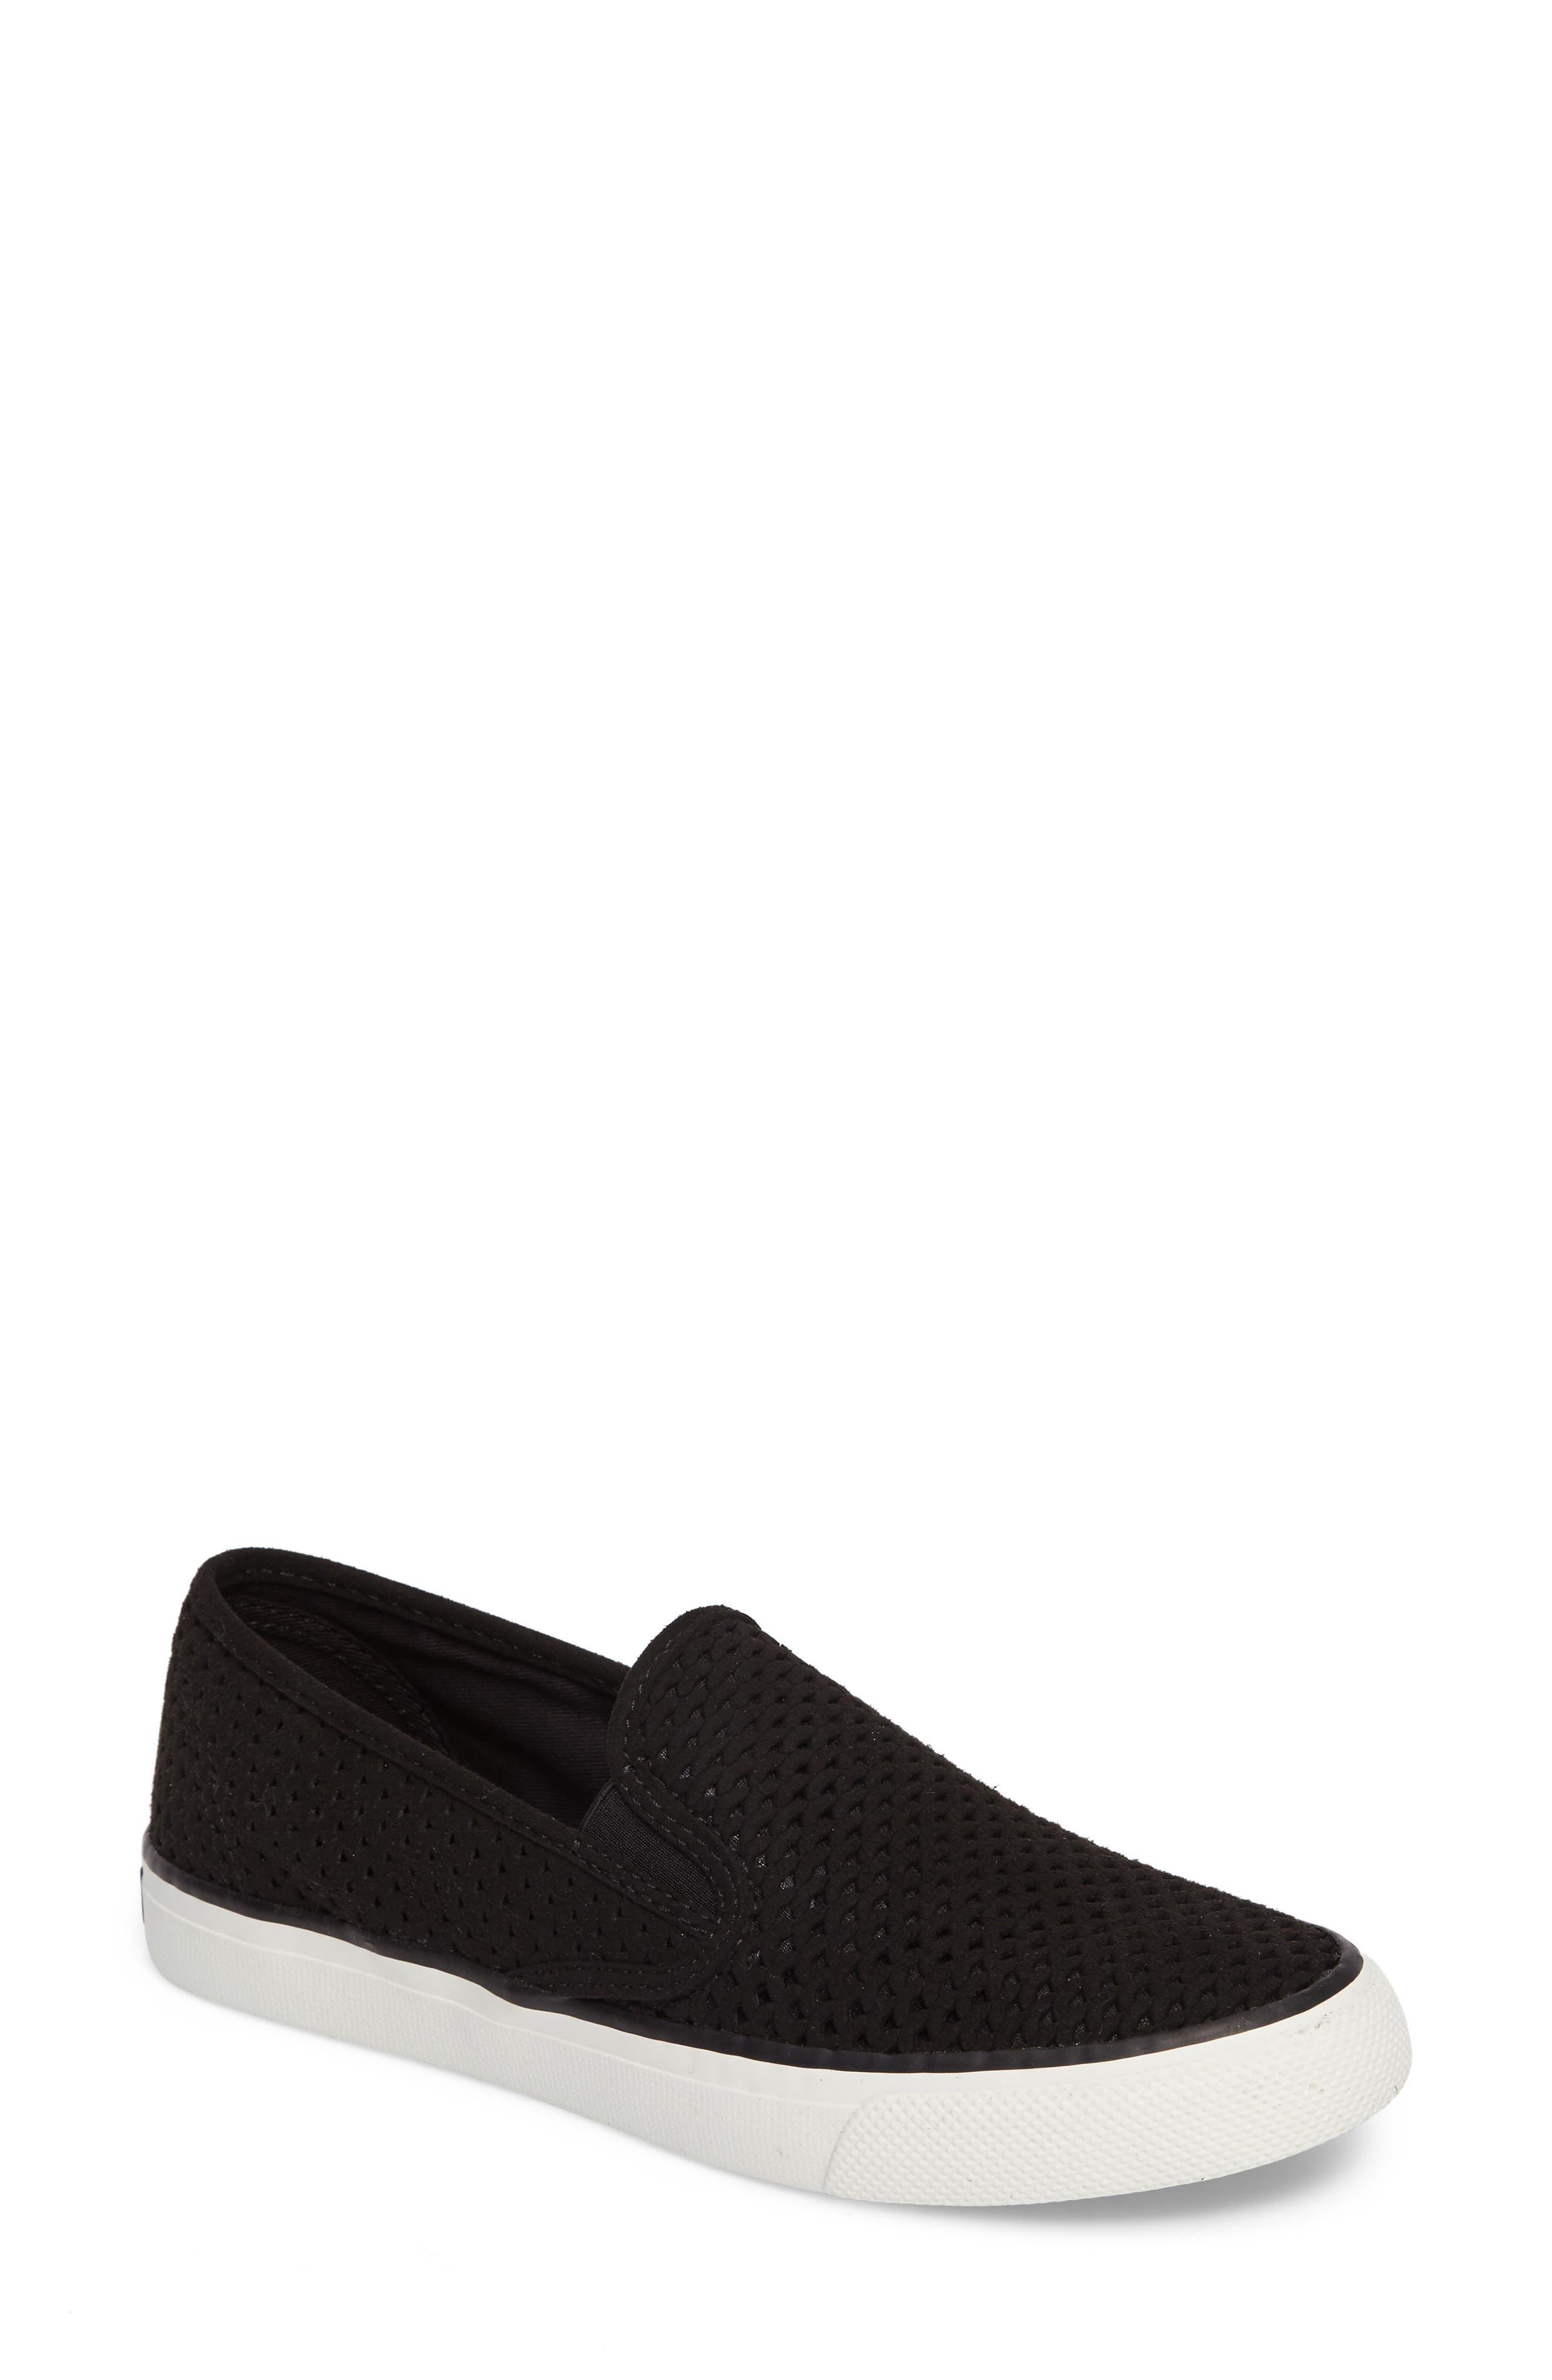 'Seaside' Perforated Slip-On Sneaker,                         Main,                         color, Black/ Black Leather